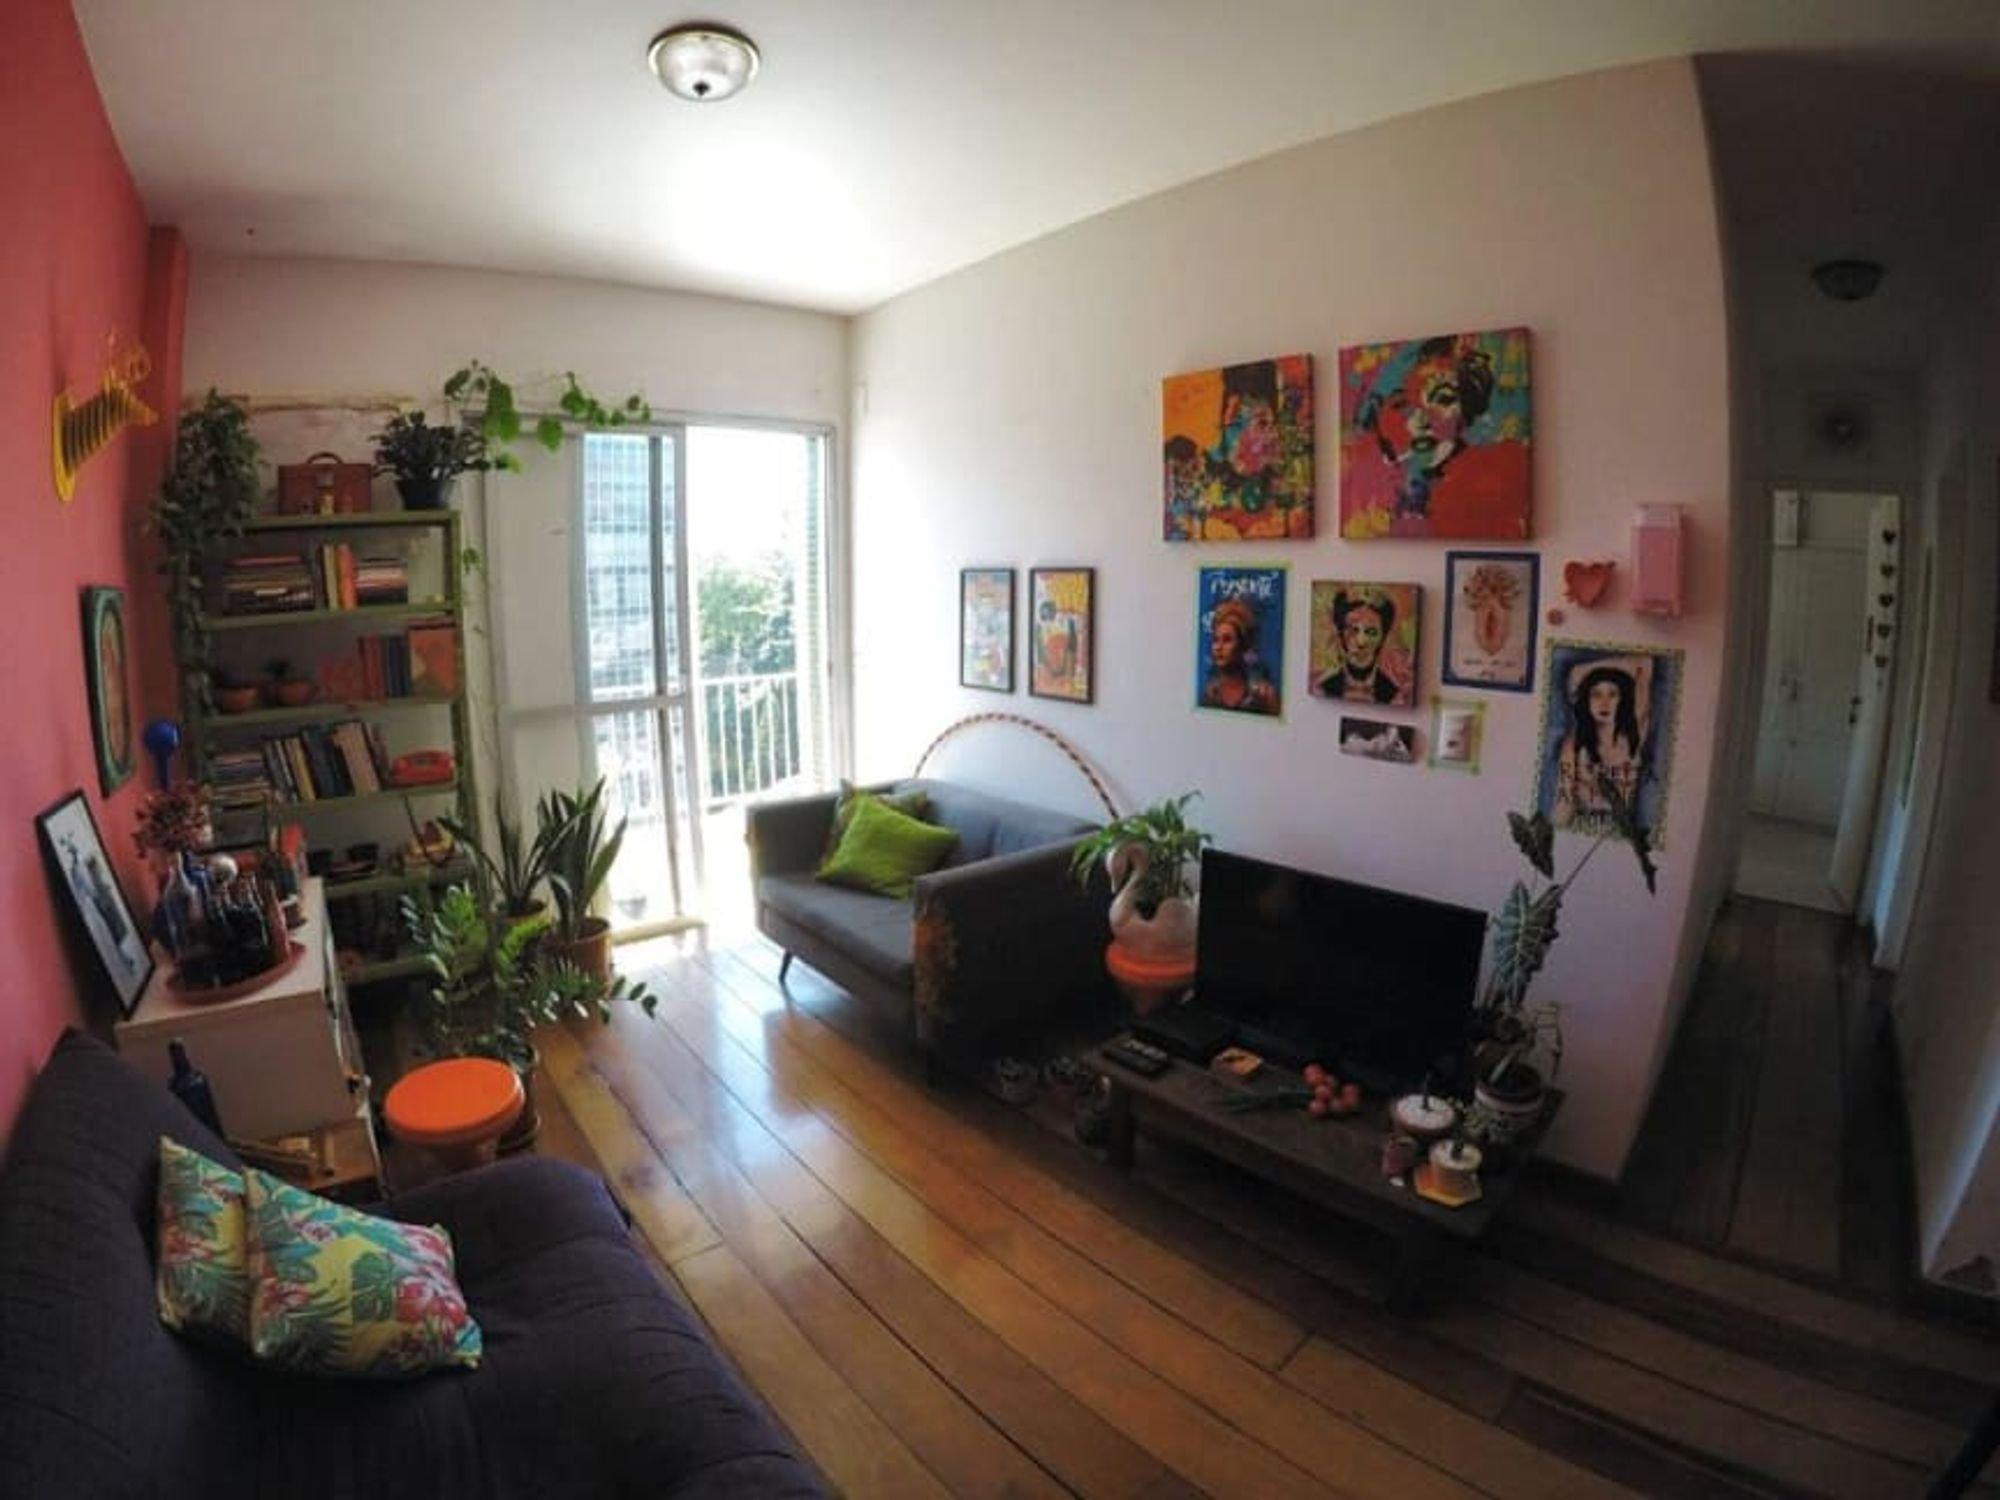 Foto de Sala com vaso de planta, sofá, livro